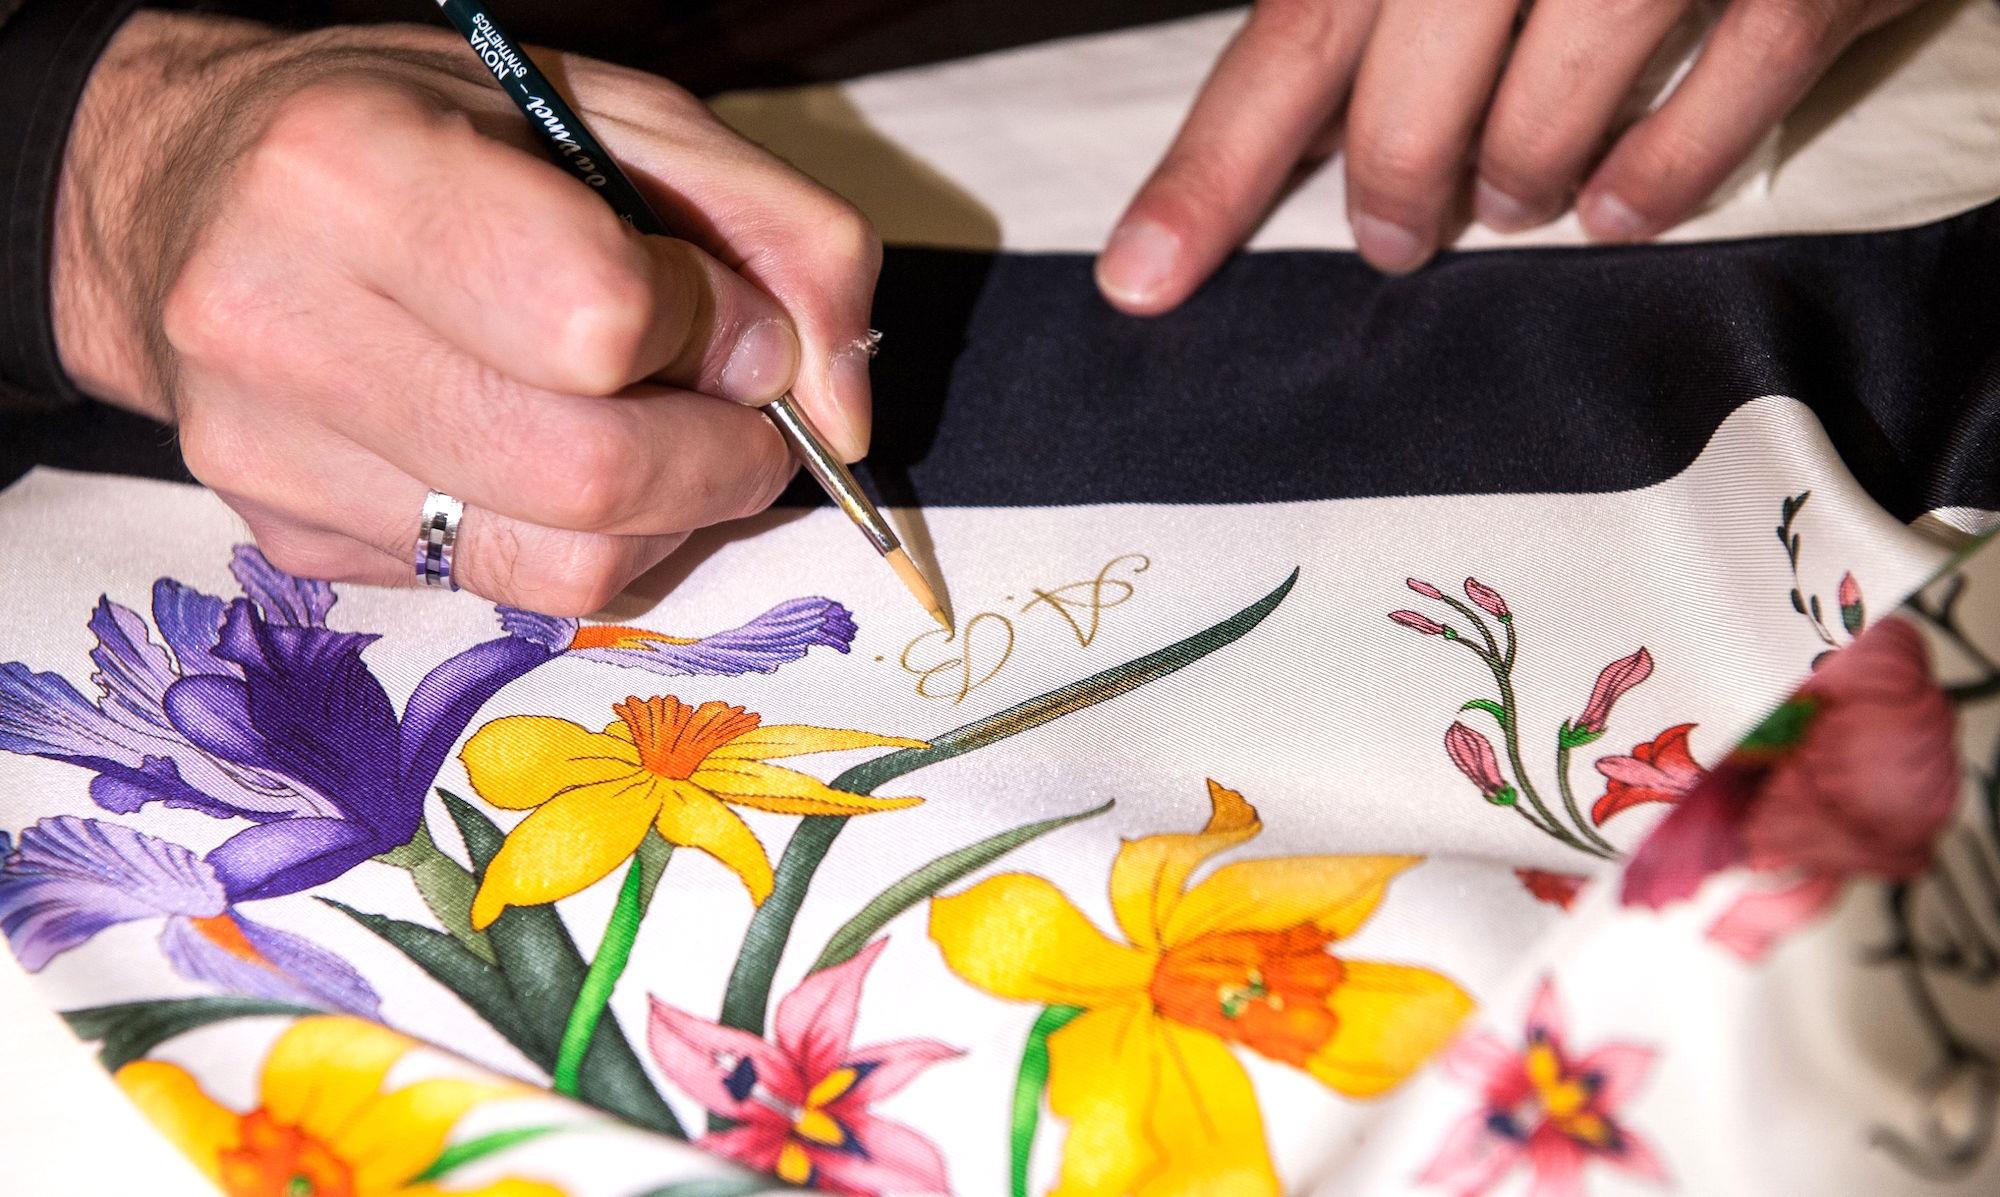 Foulard Flora di Gucci - La storia